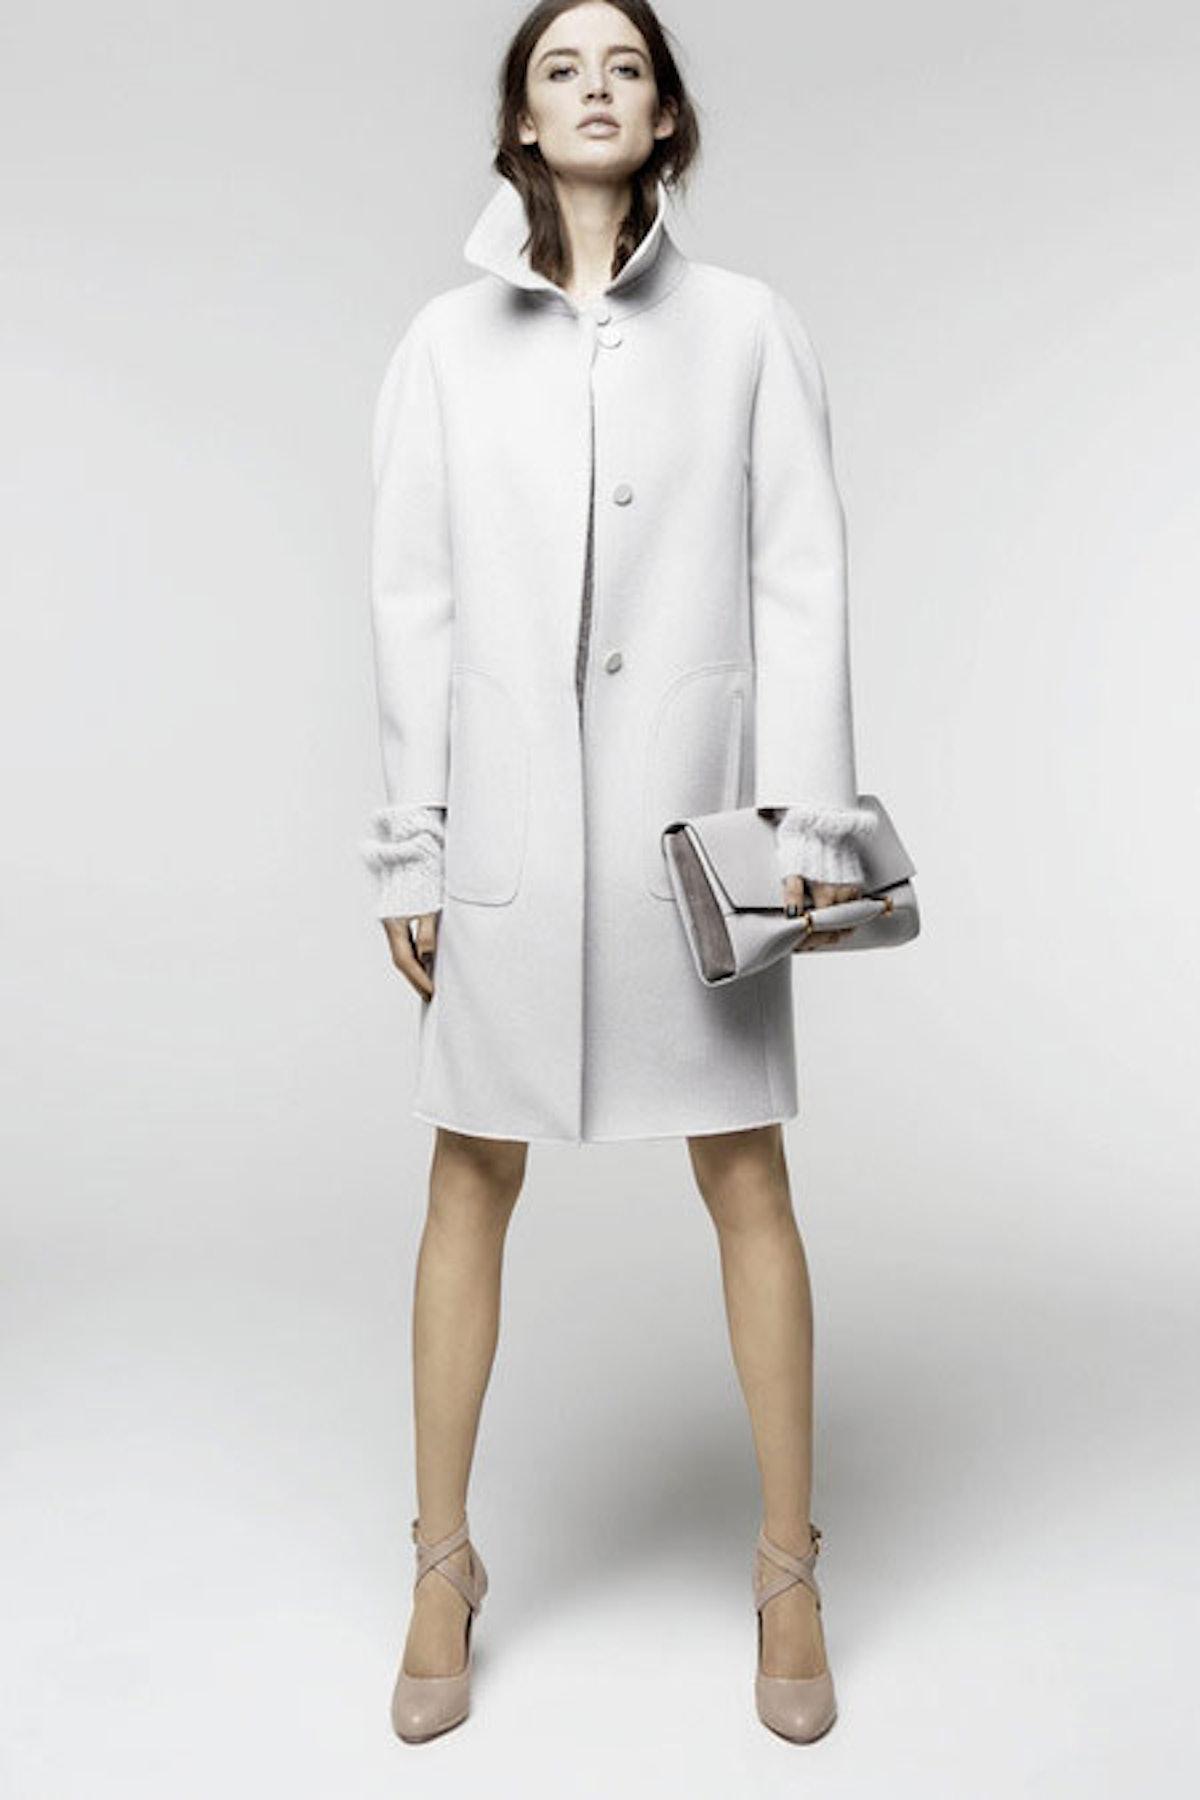 __[Nina Ricci](http://www.wmagazine.com/mood-board/filter?q=^Designer|Nina%20Ricci|):__ A coat that ...